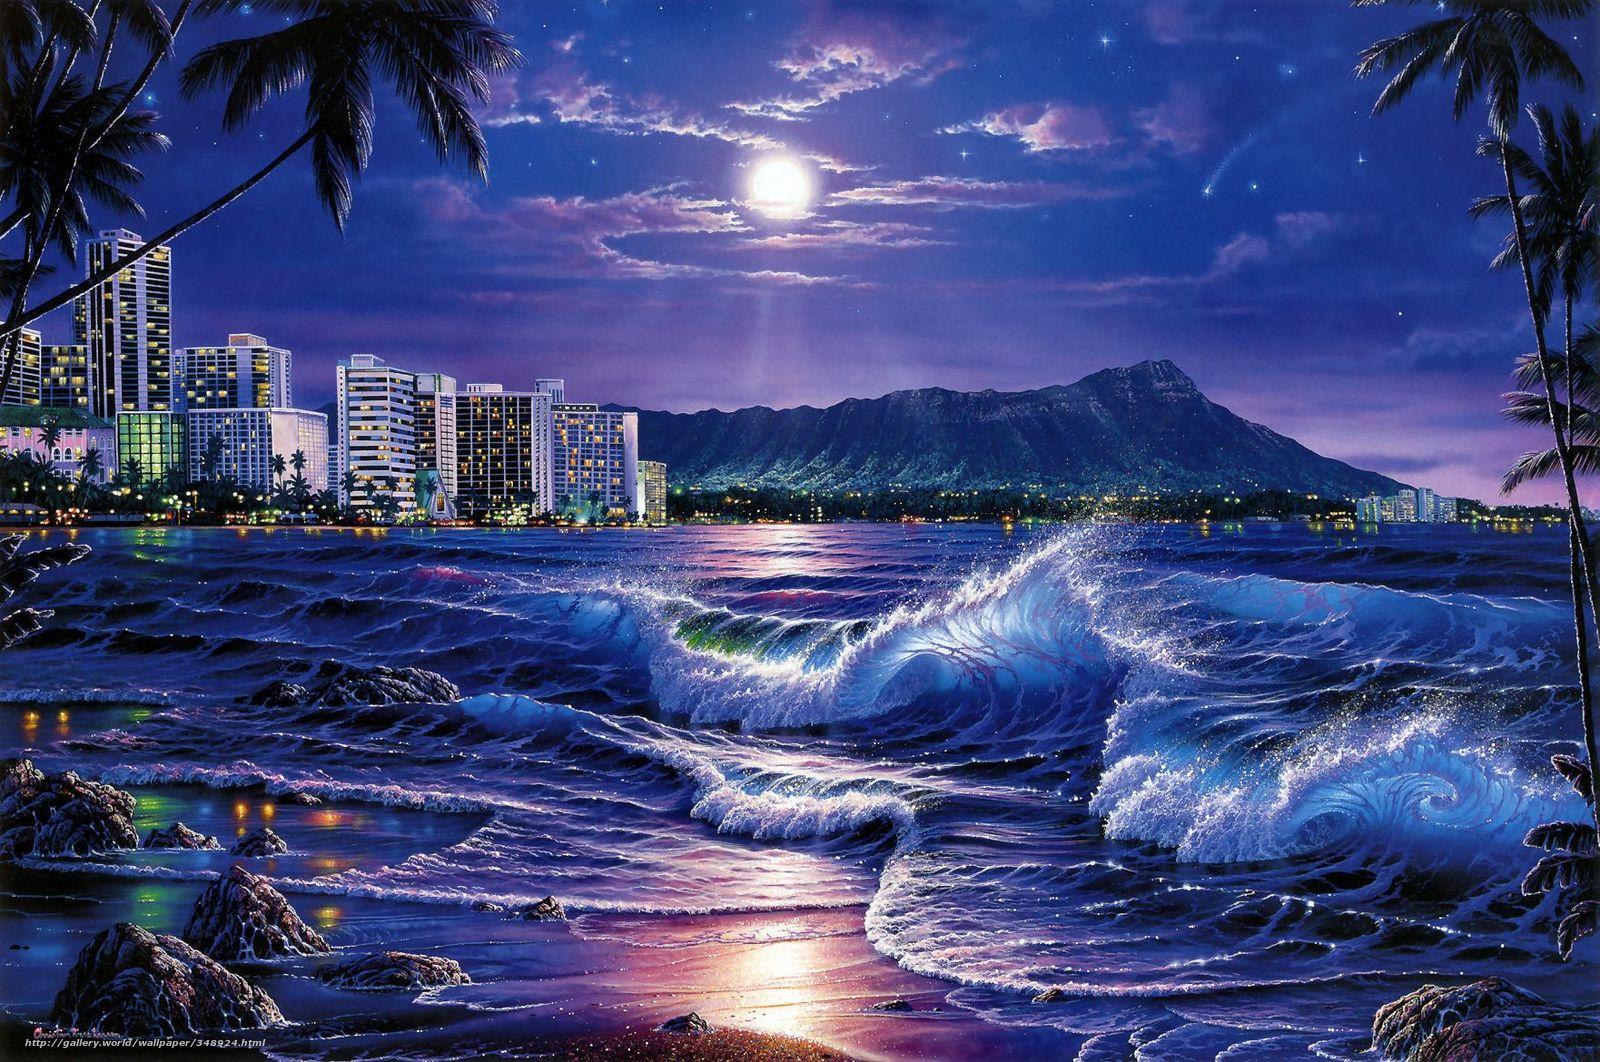 Free Download Wallpaper Christian Riese Lassen Waikiki Ocean City